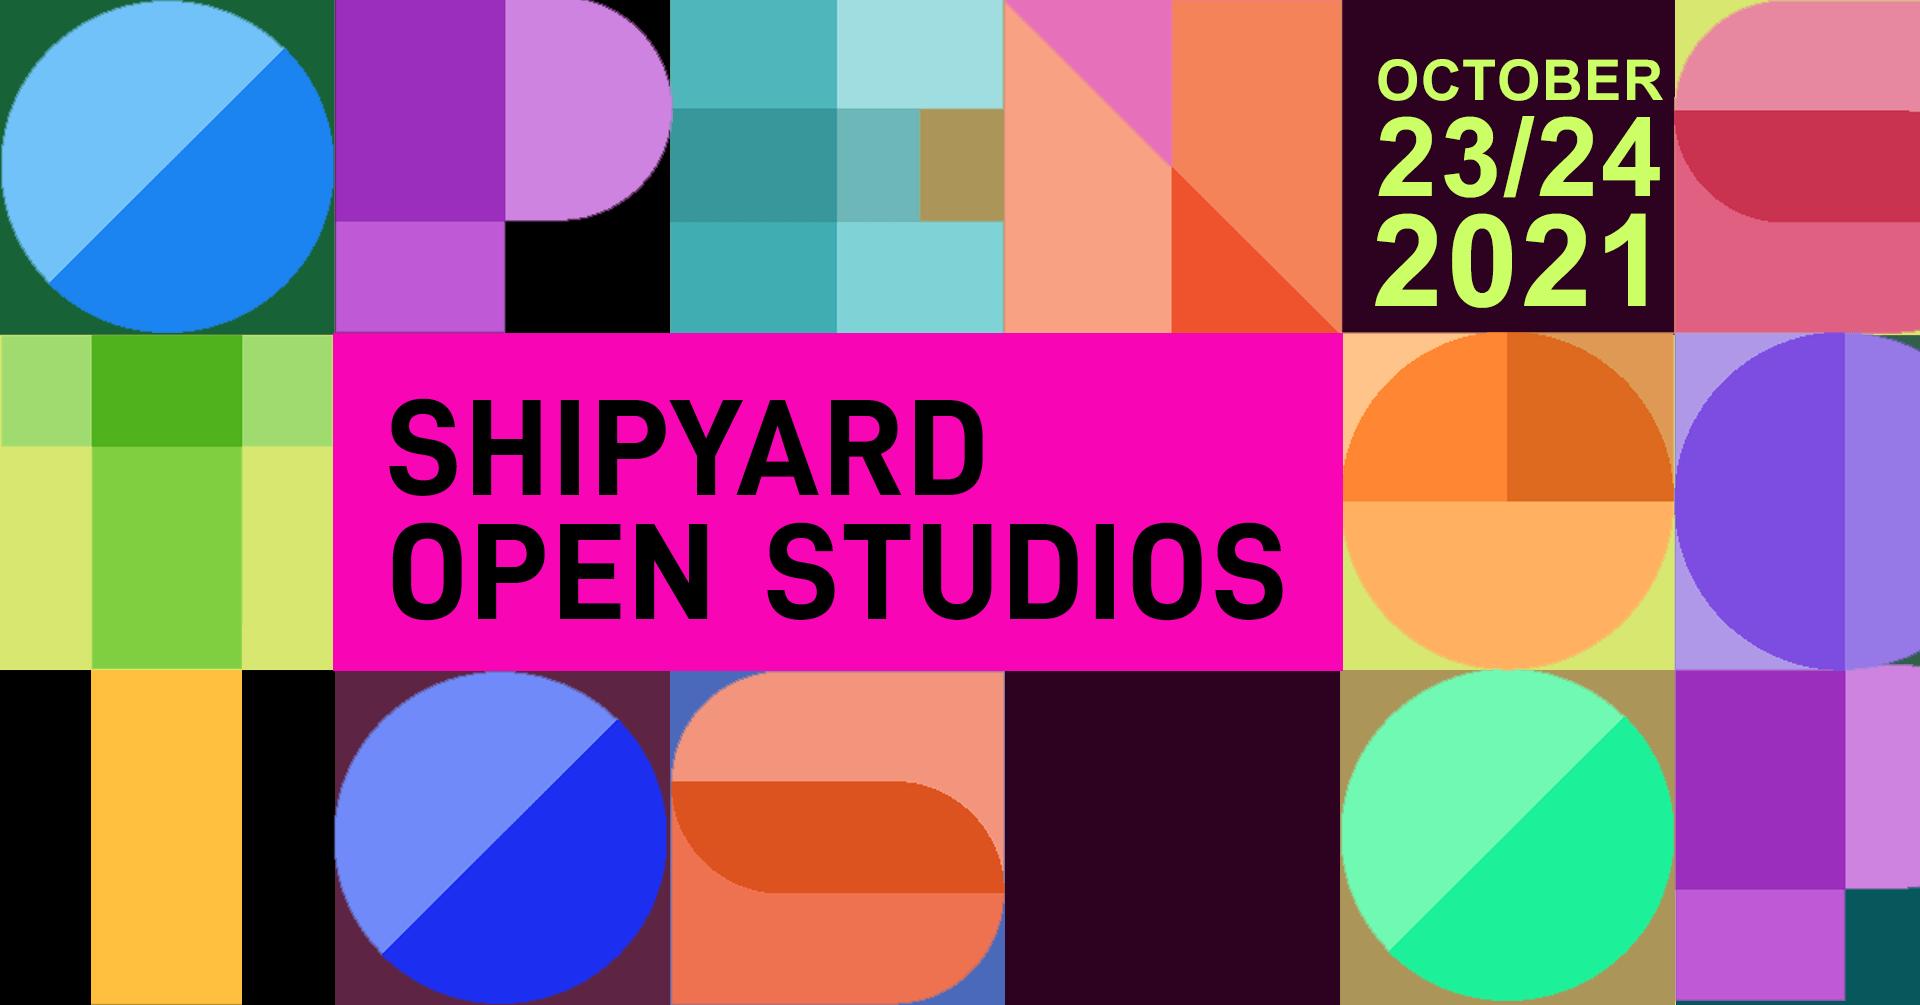 Shipyard Open Studios 2021